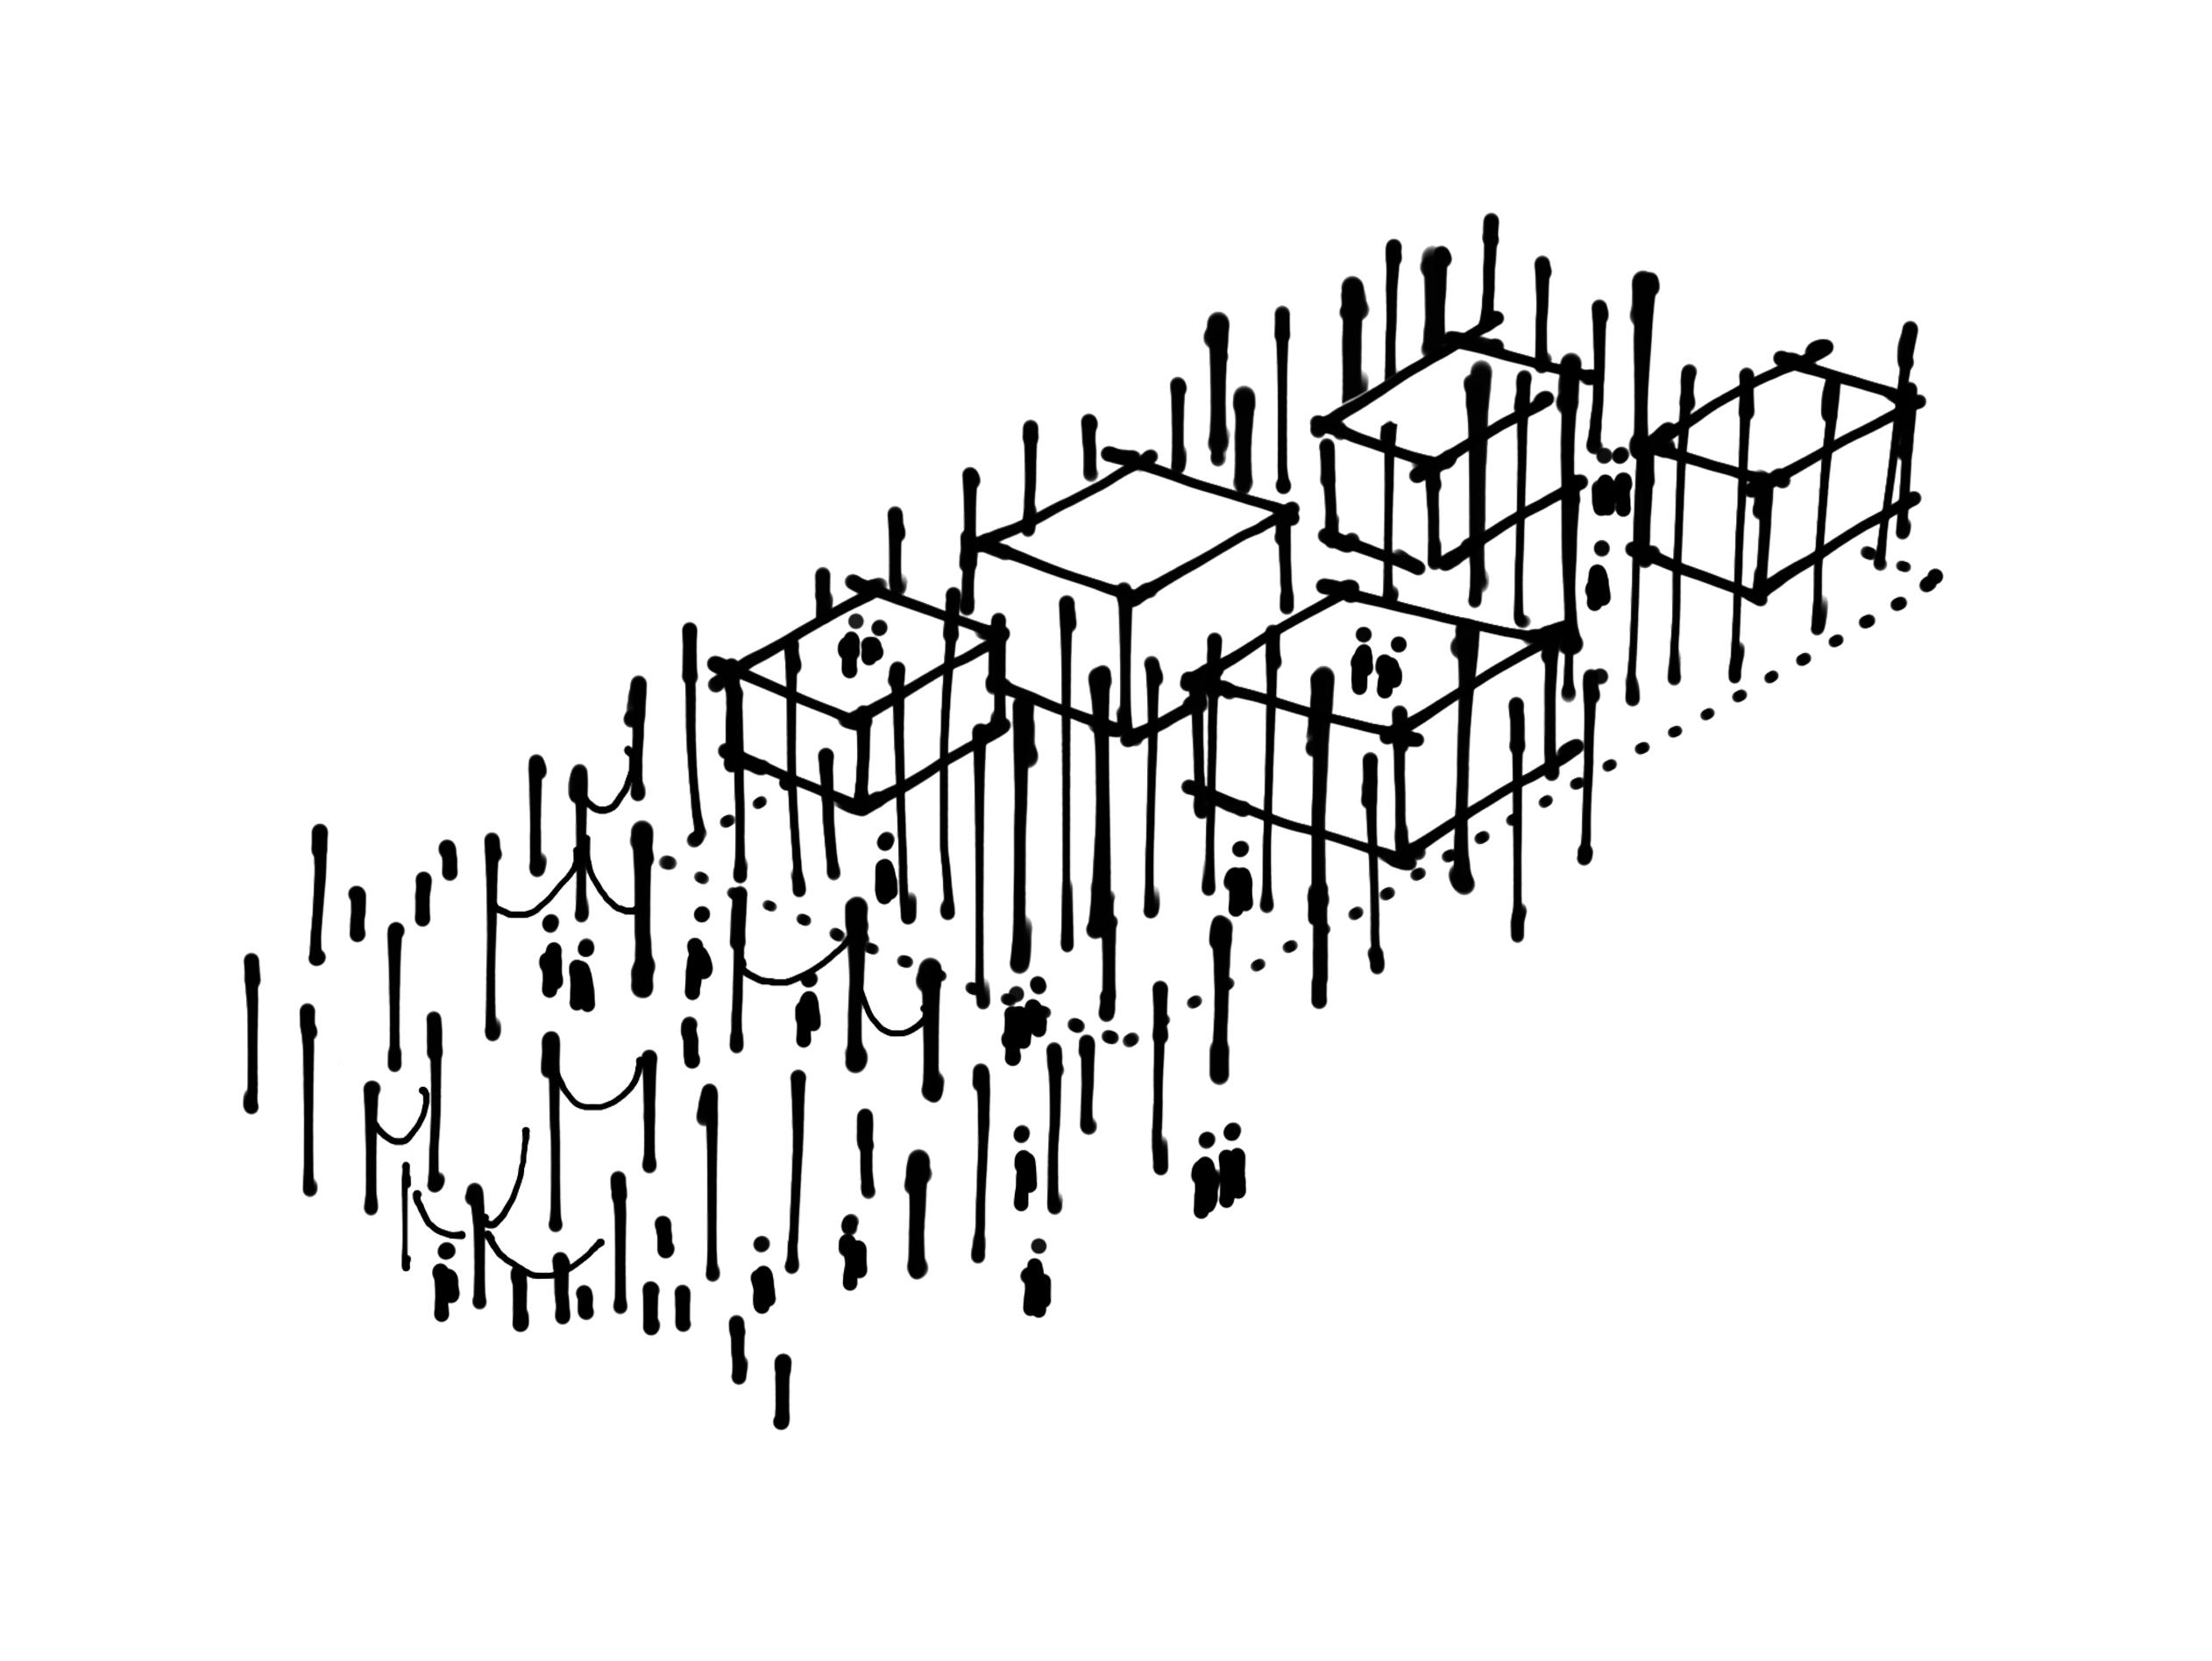 Alessandro-Ripellino-Arkitekter_Studio-Adrien-Gardere_Luigi-Pardo-Architetti_the-forest_sketch diagram